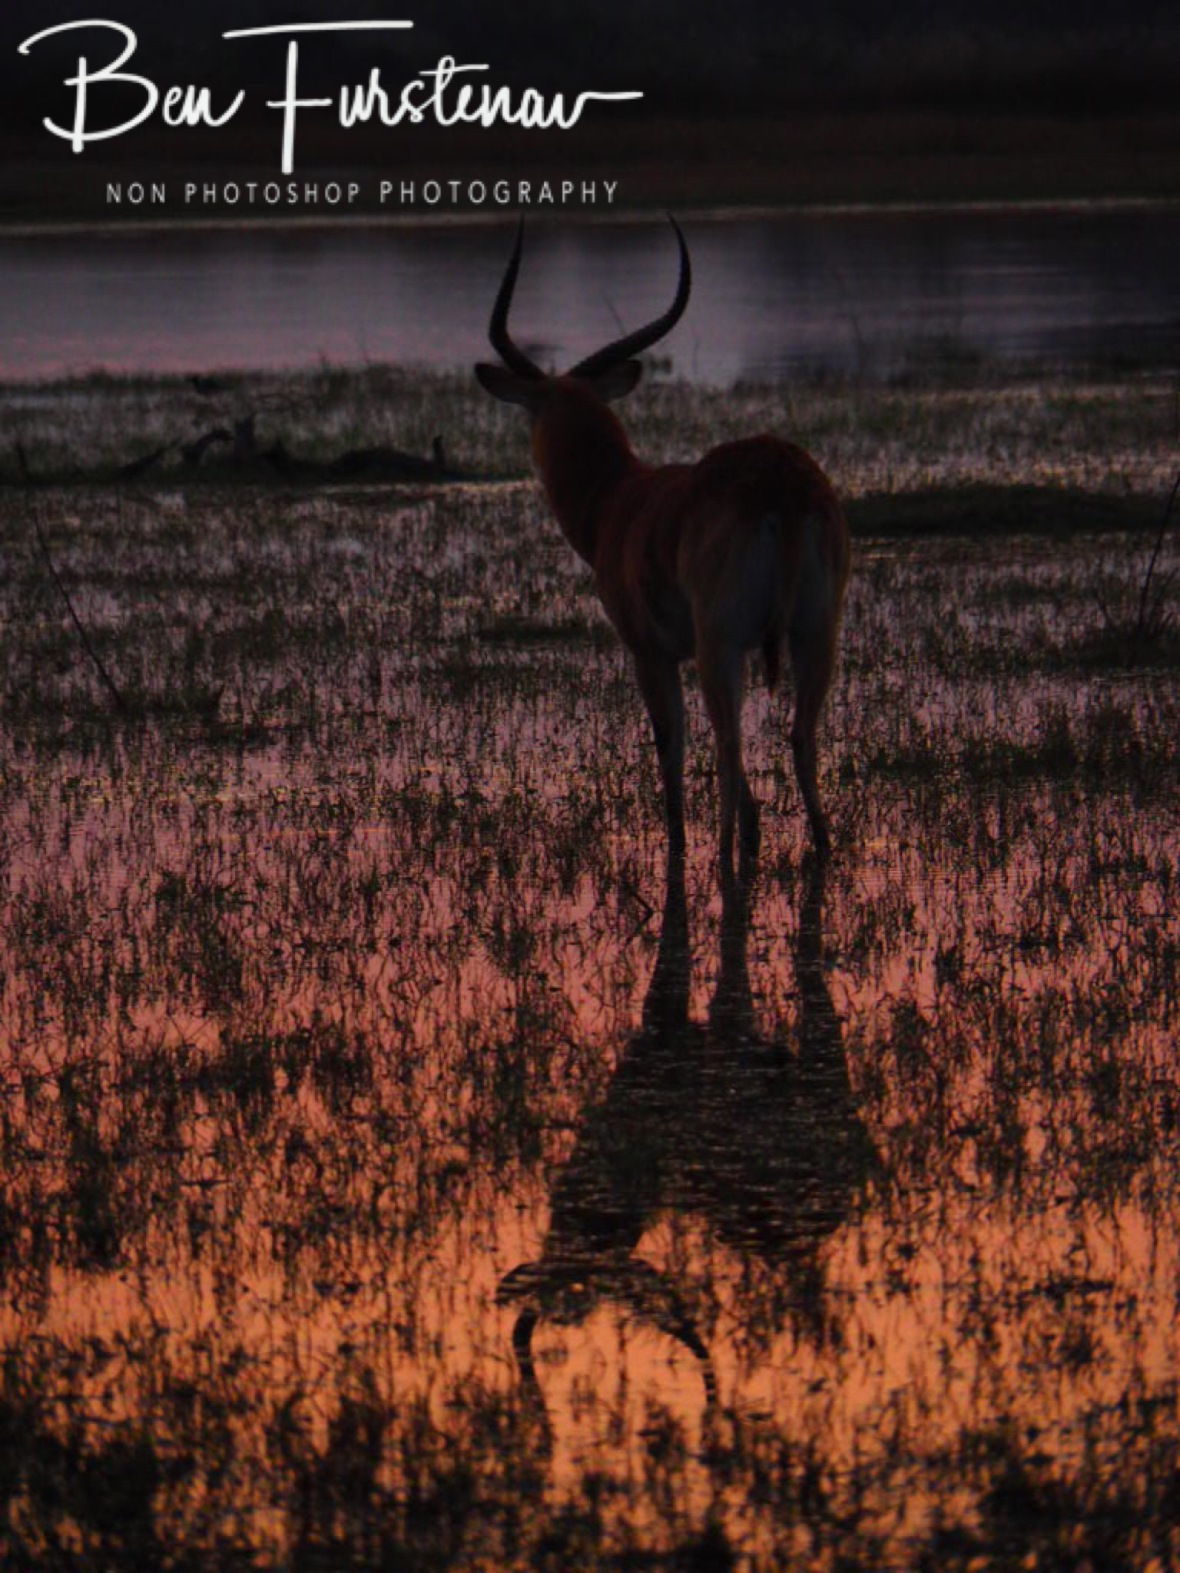 Lechwe Antilope reflections, Moremi National Park, Okavango Delta, Botswana